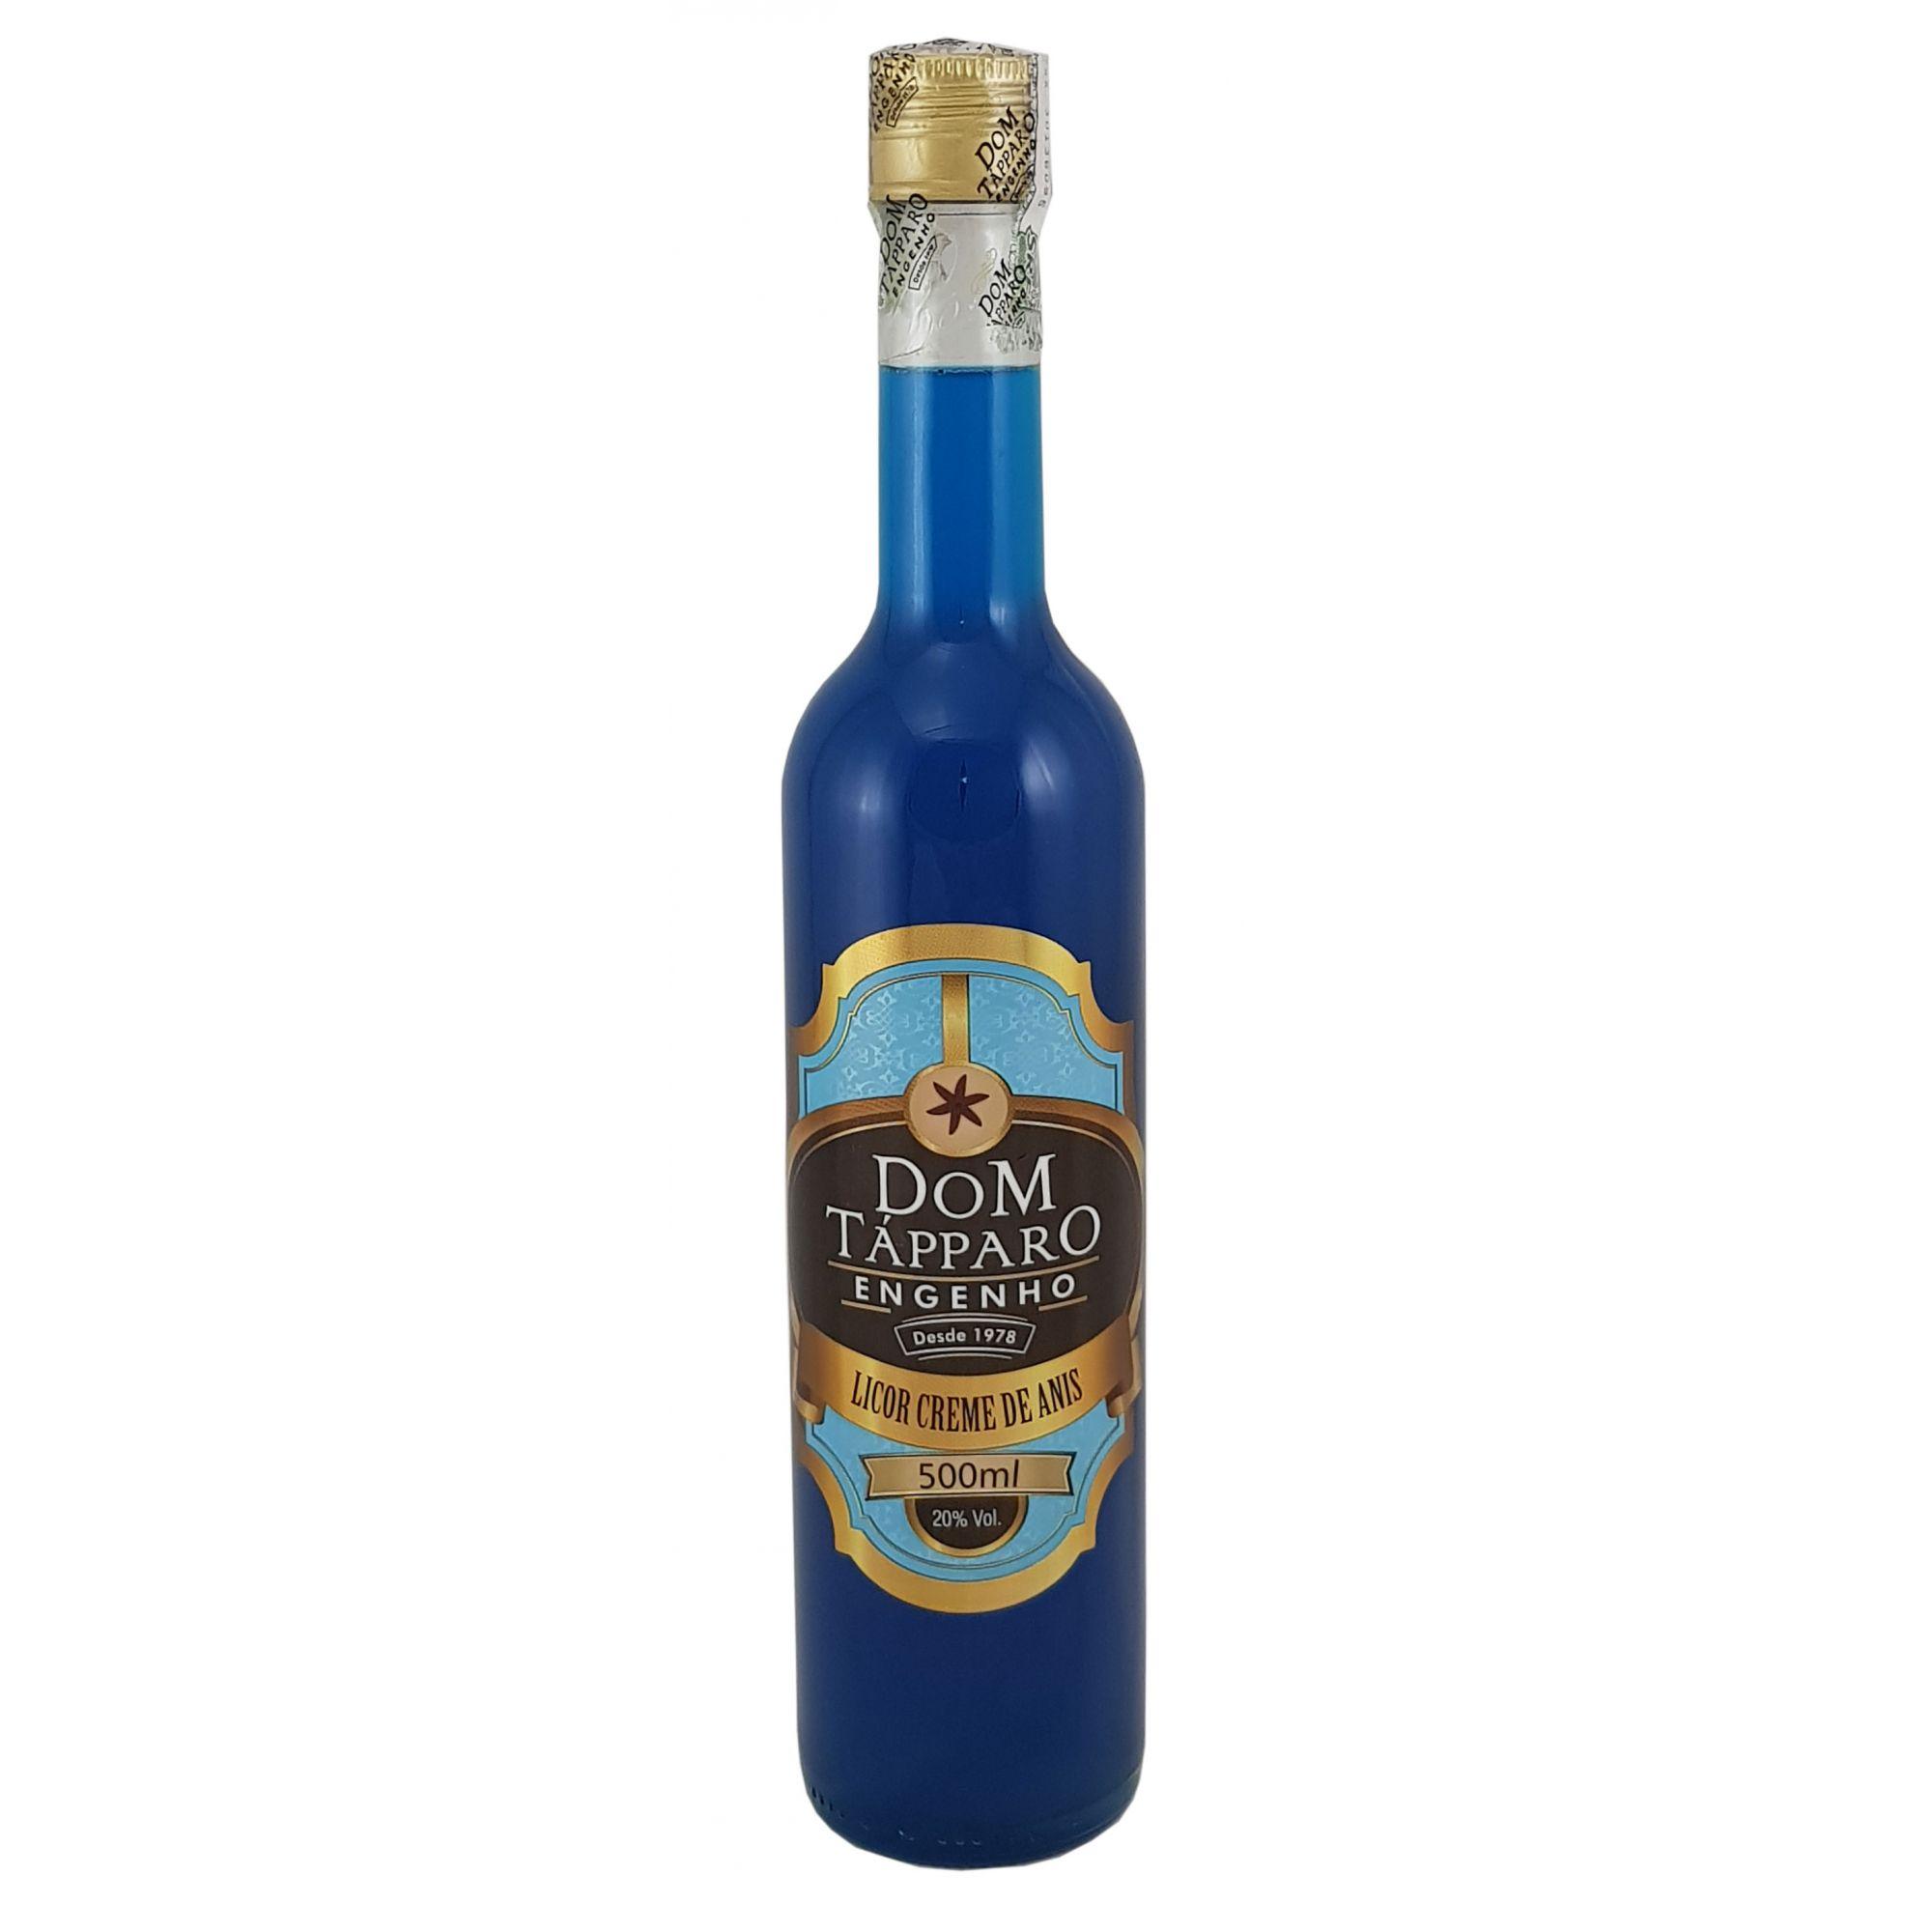 Licor Creme de Anis Dom Tápparo 500ml